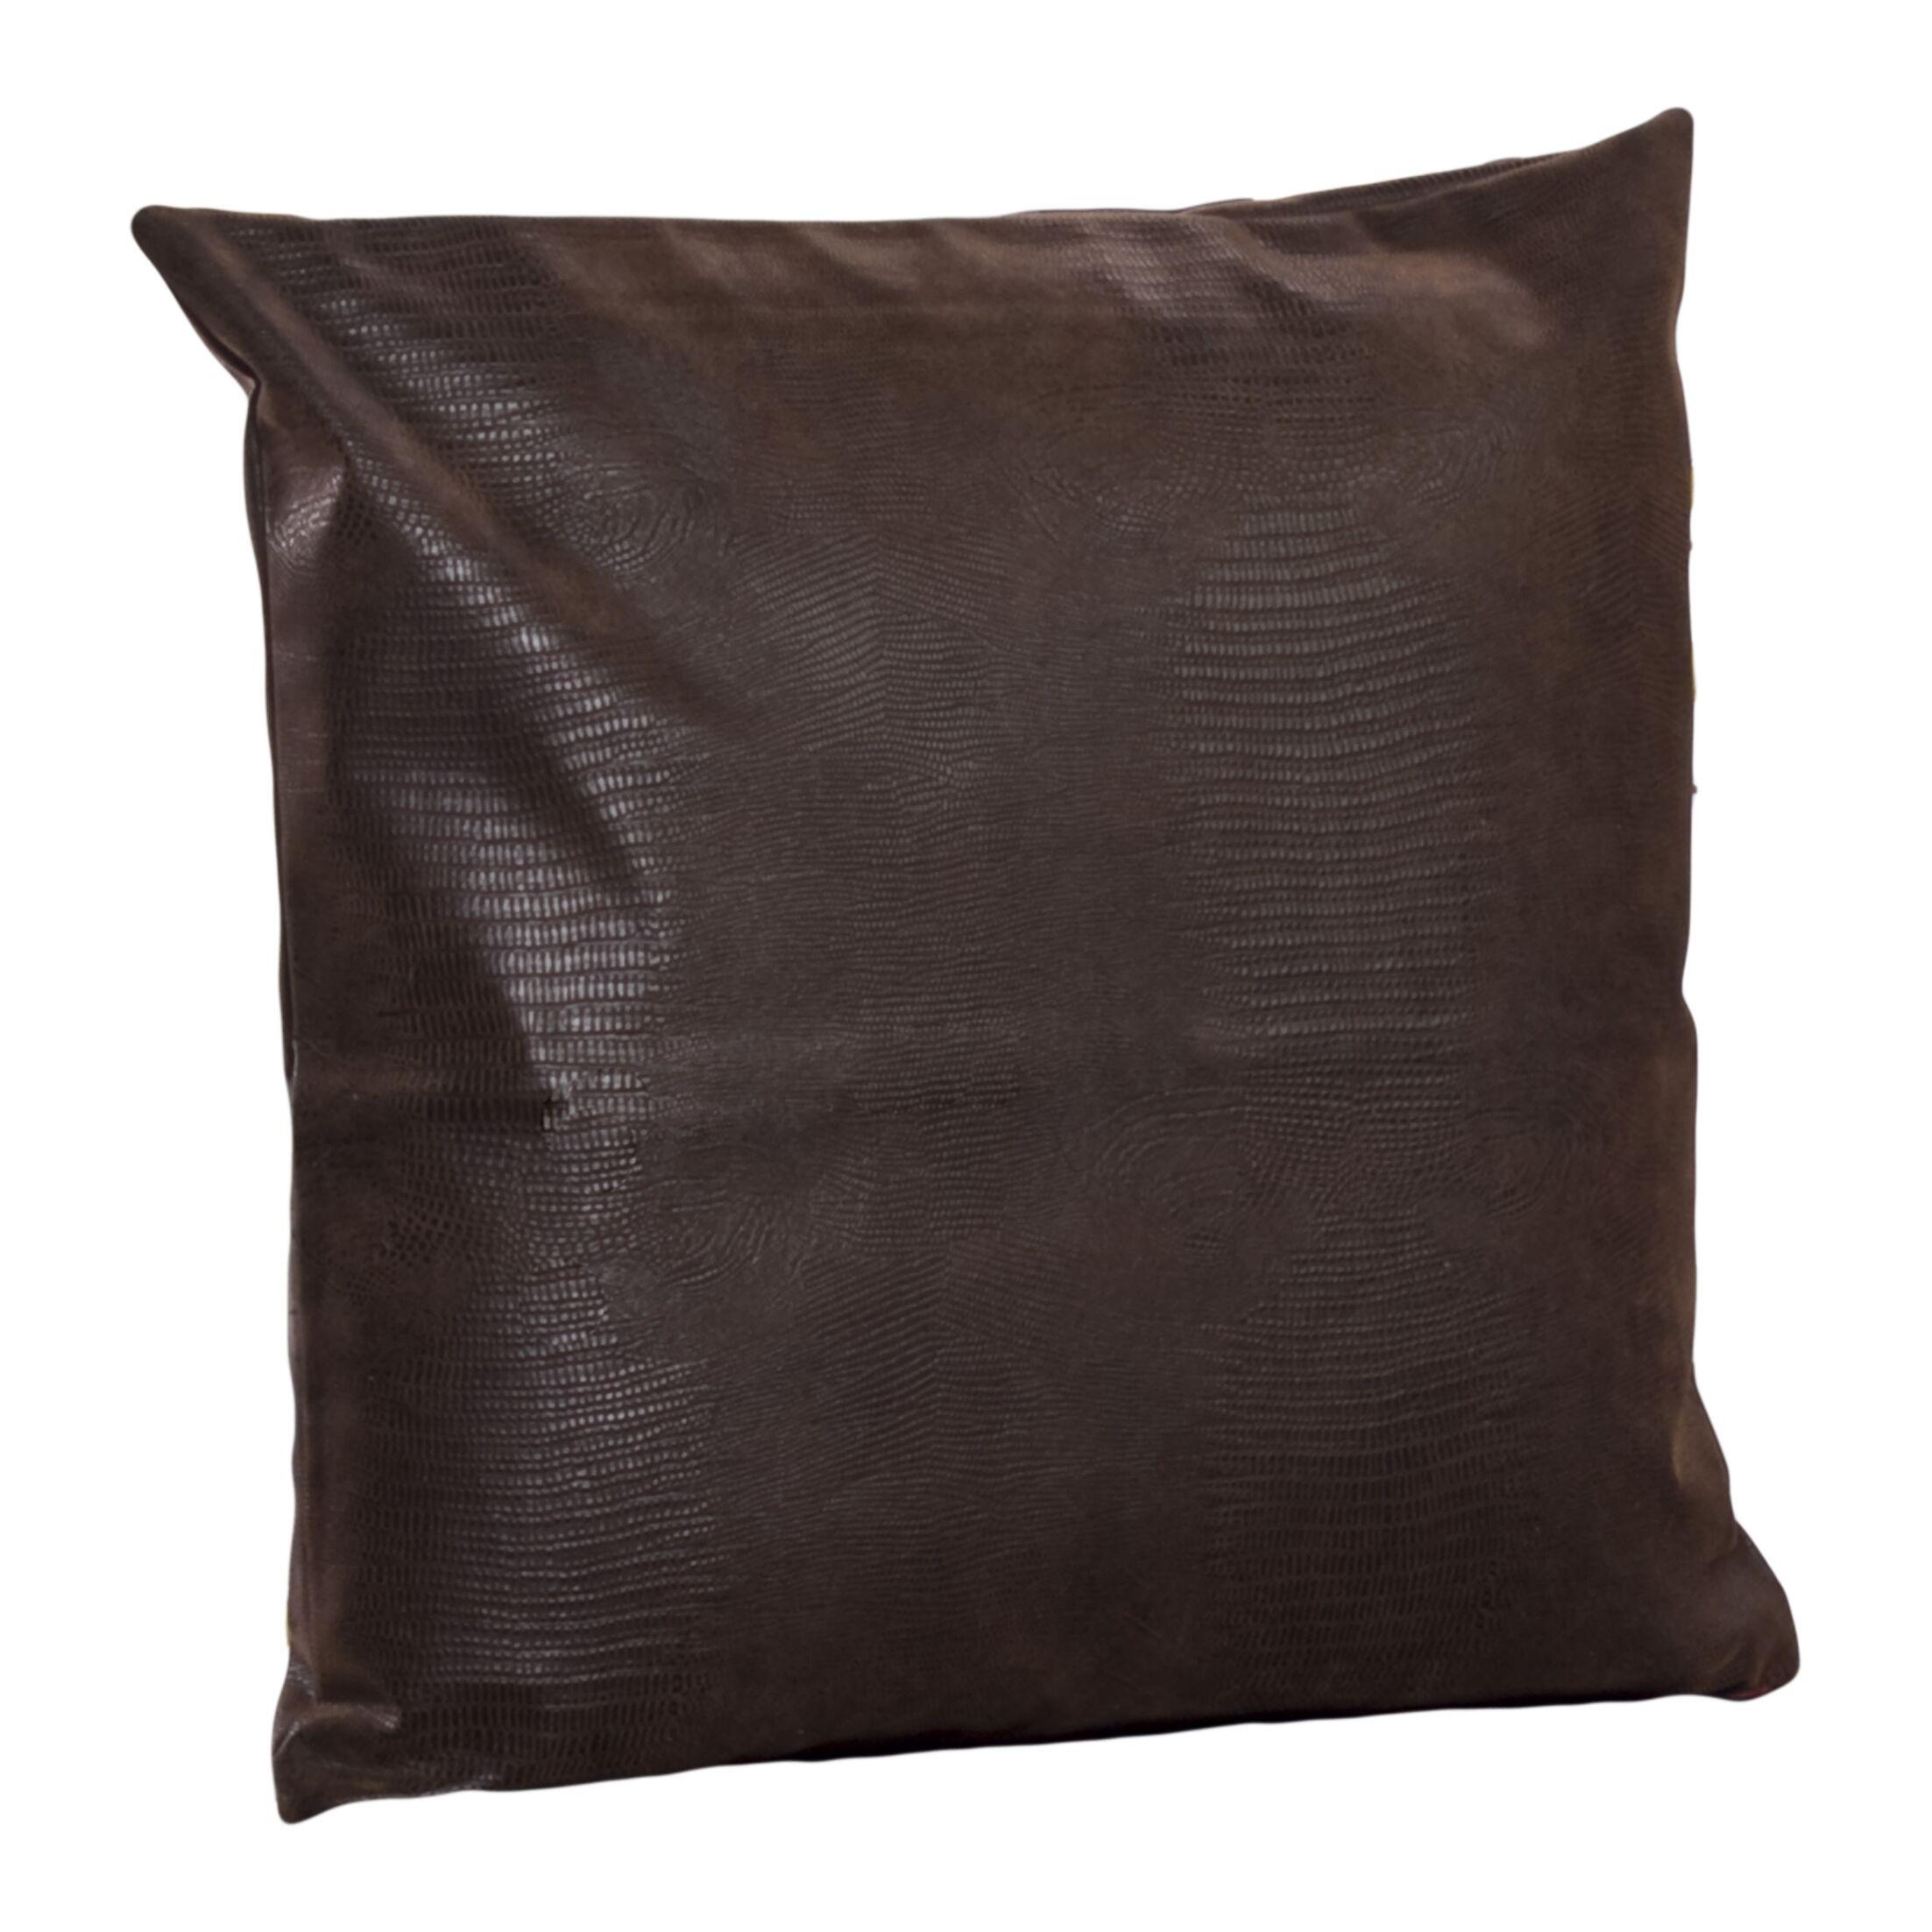 Braylen Throw Pillow (Set of 2) Size: 26